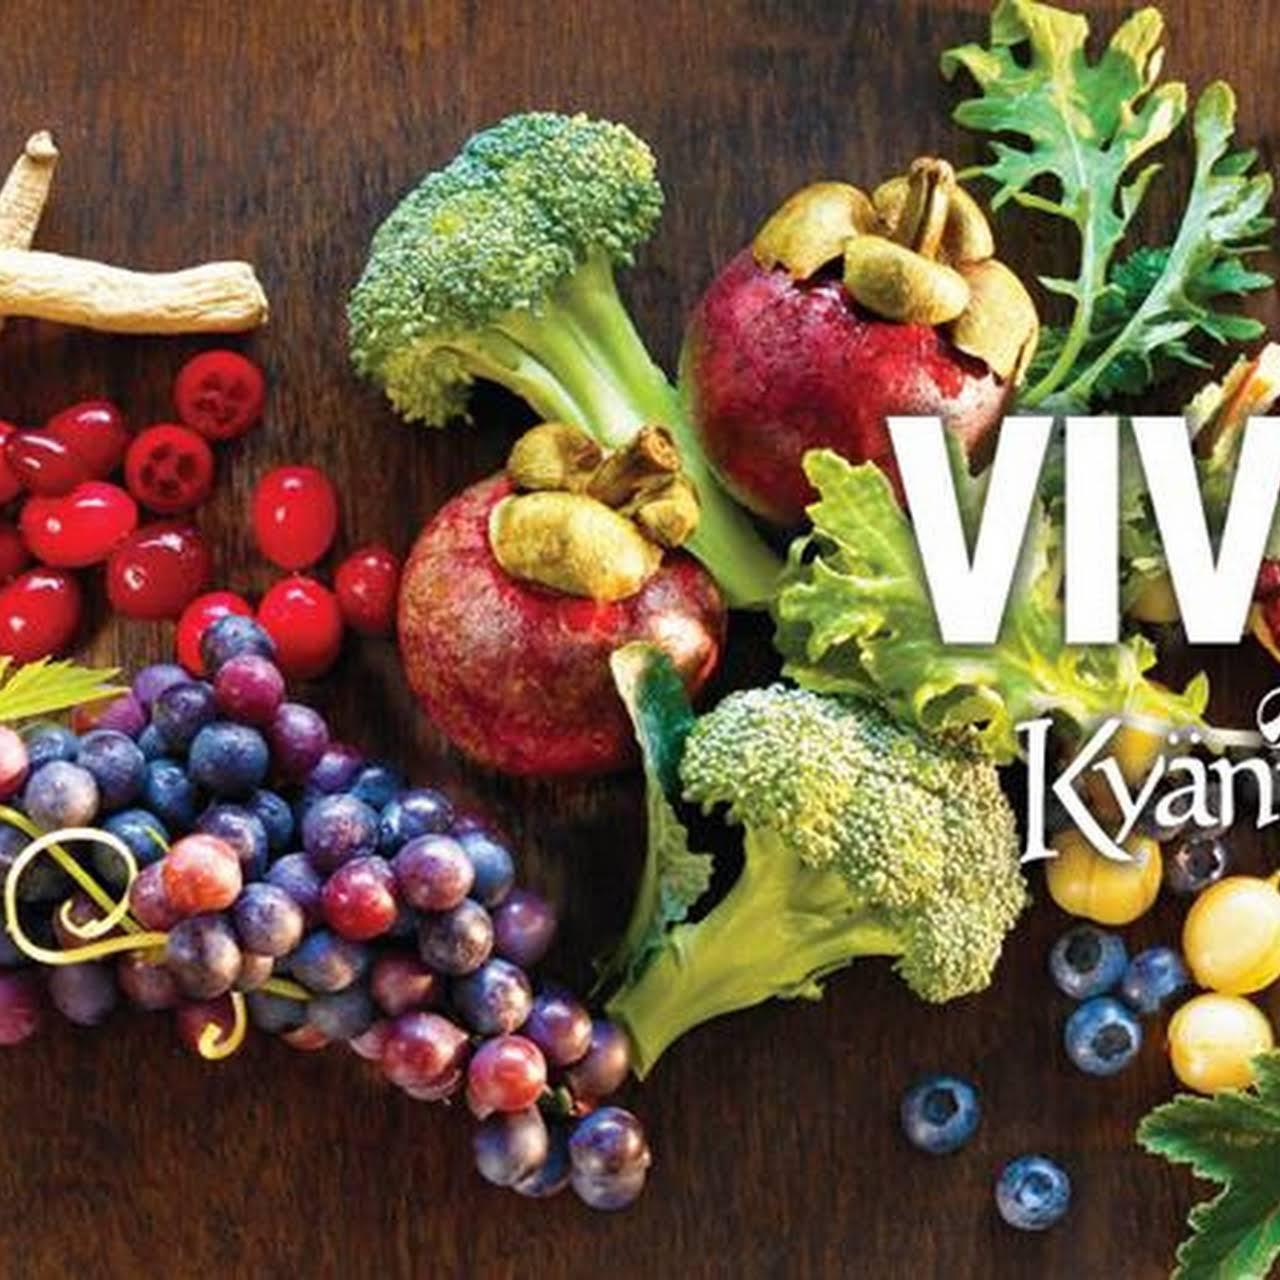 Kyani Distributor Honduras Vitamin Supplements Store In San